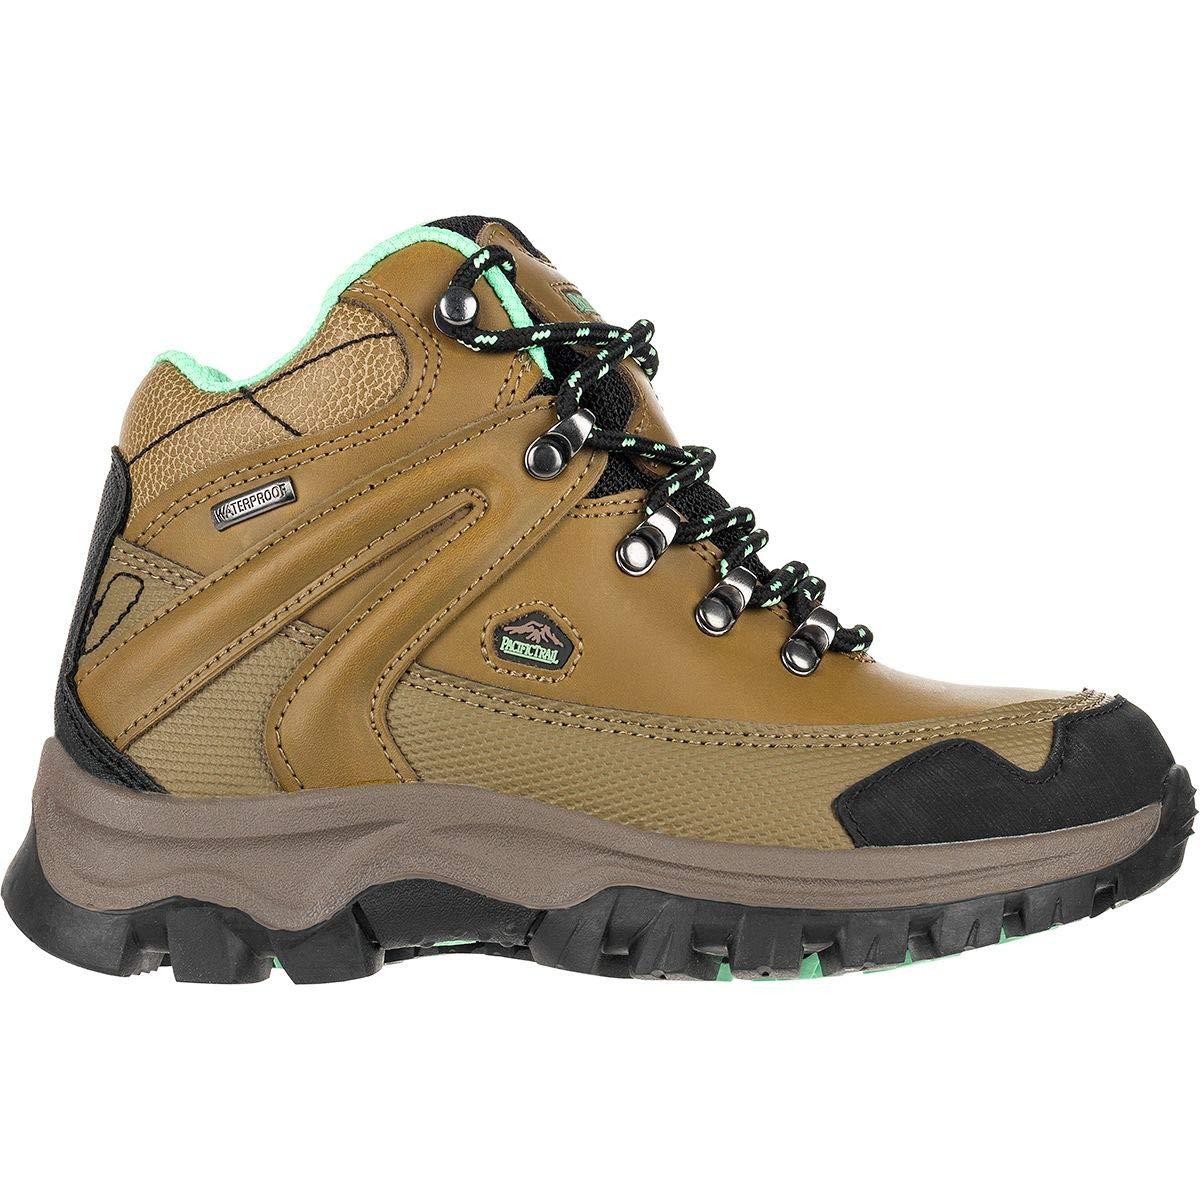 f335e7c80d9 Amazon.com | Pacific Trail Rainier Jr. Hiking Boot - Kids' | Boots